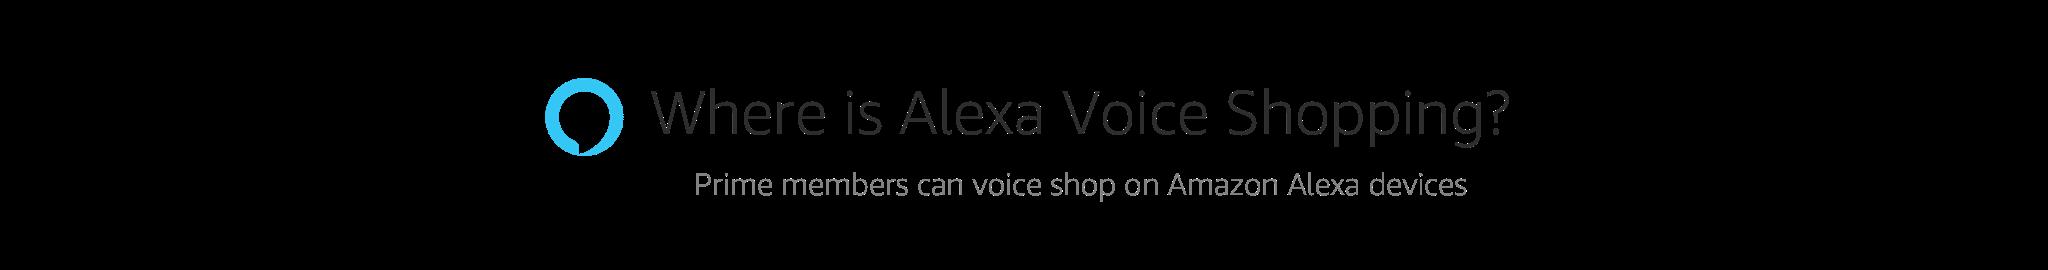 Where is Alexa Voice Shopping?